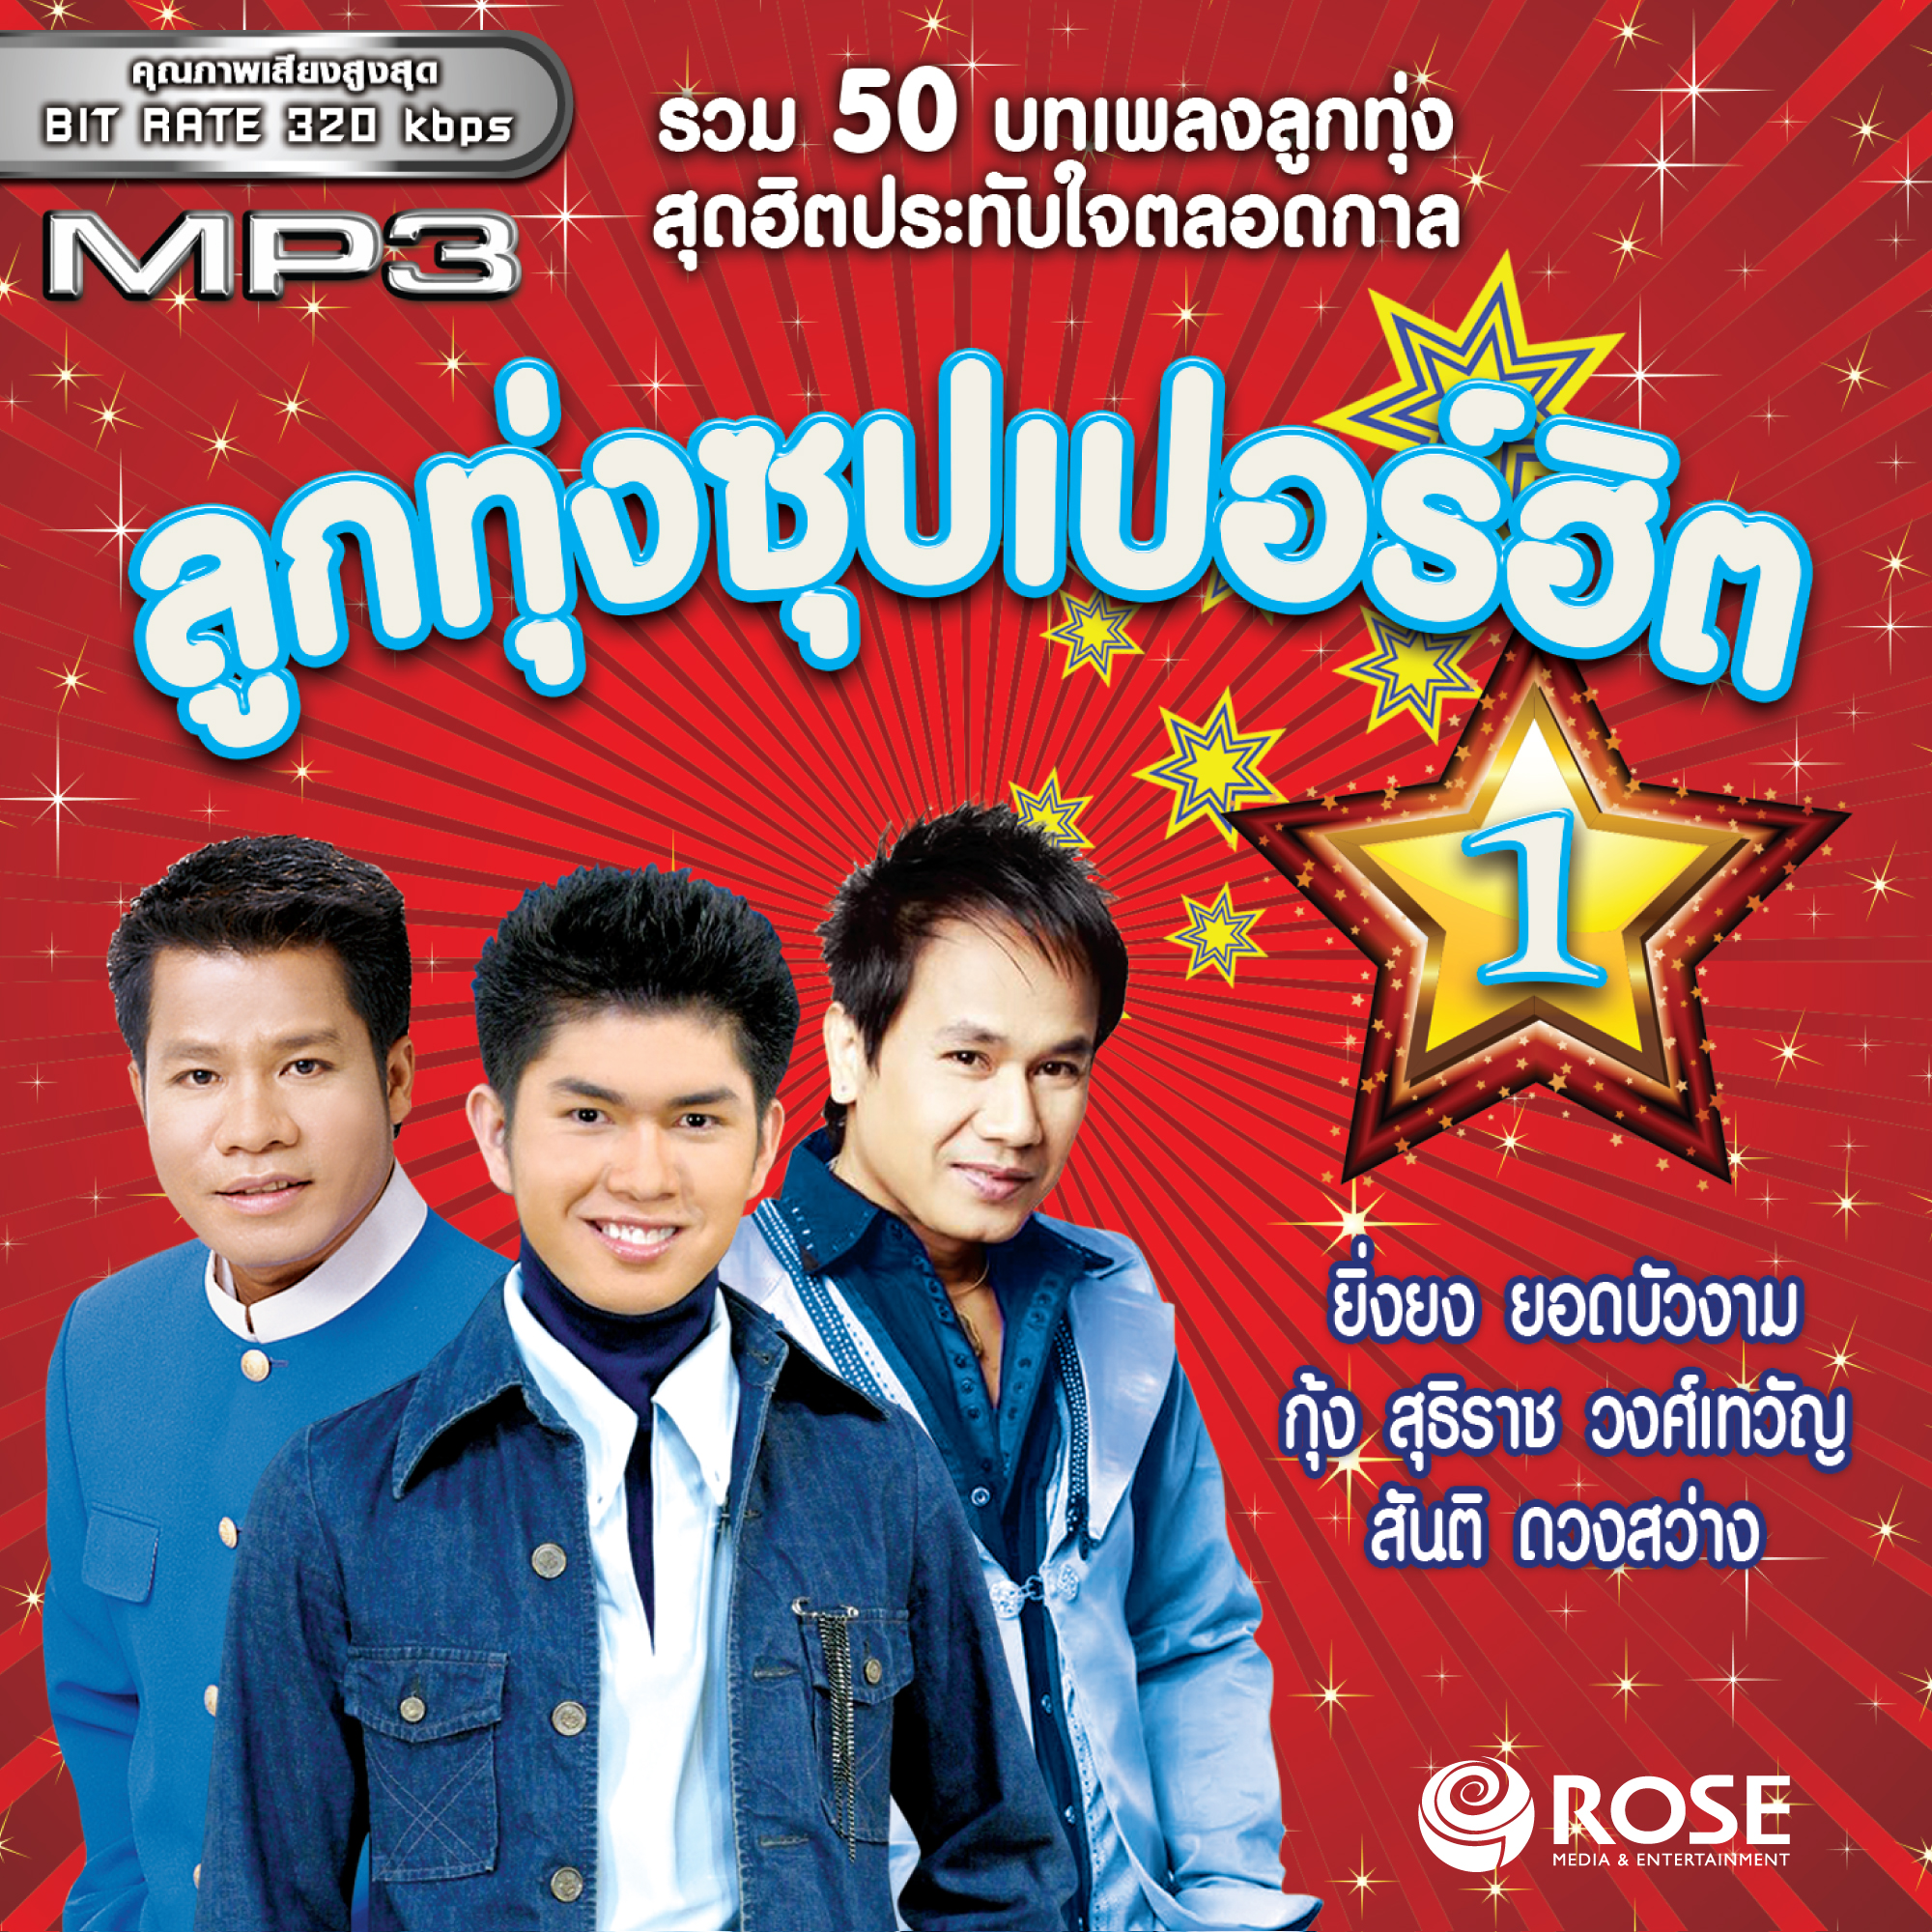 MP3 ลูกทุ่งซุเปอร์ฮิต 1 (สันติ ยิ่งยง กุ้ง)